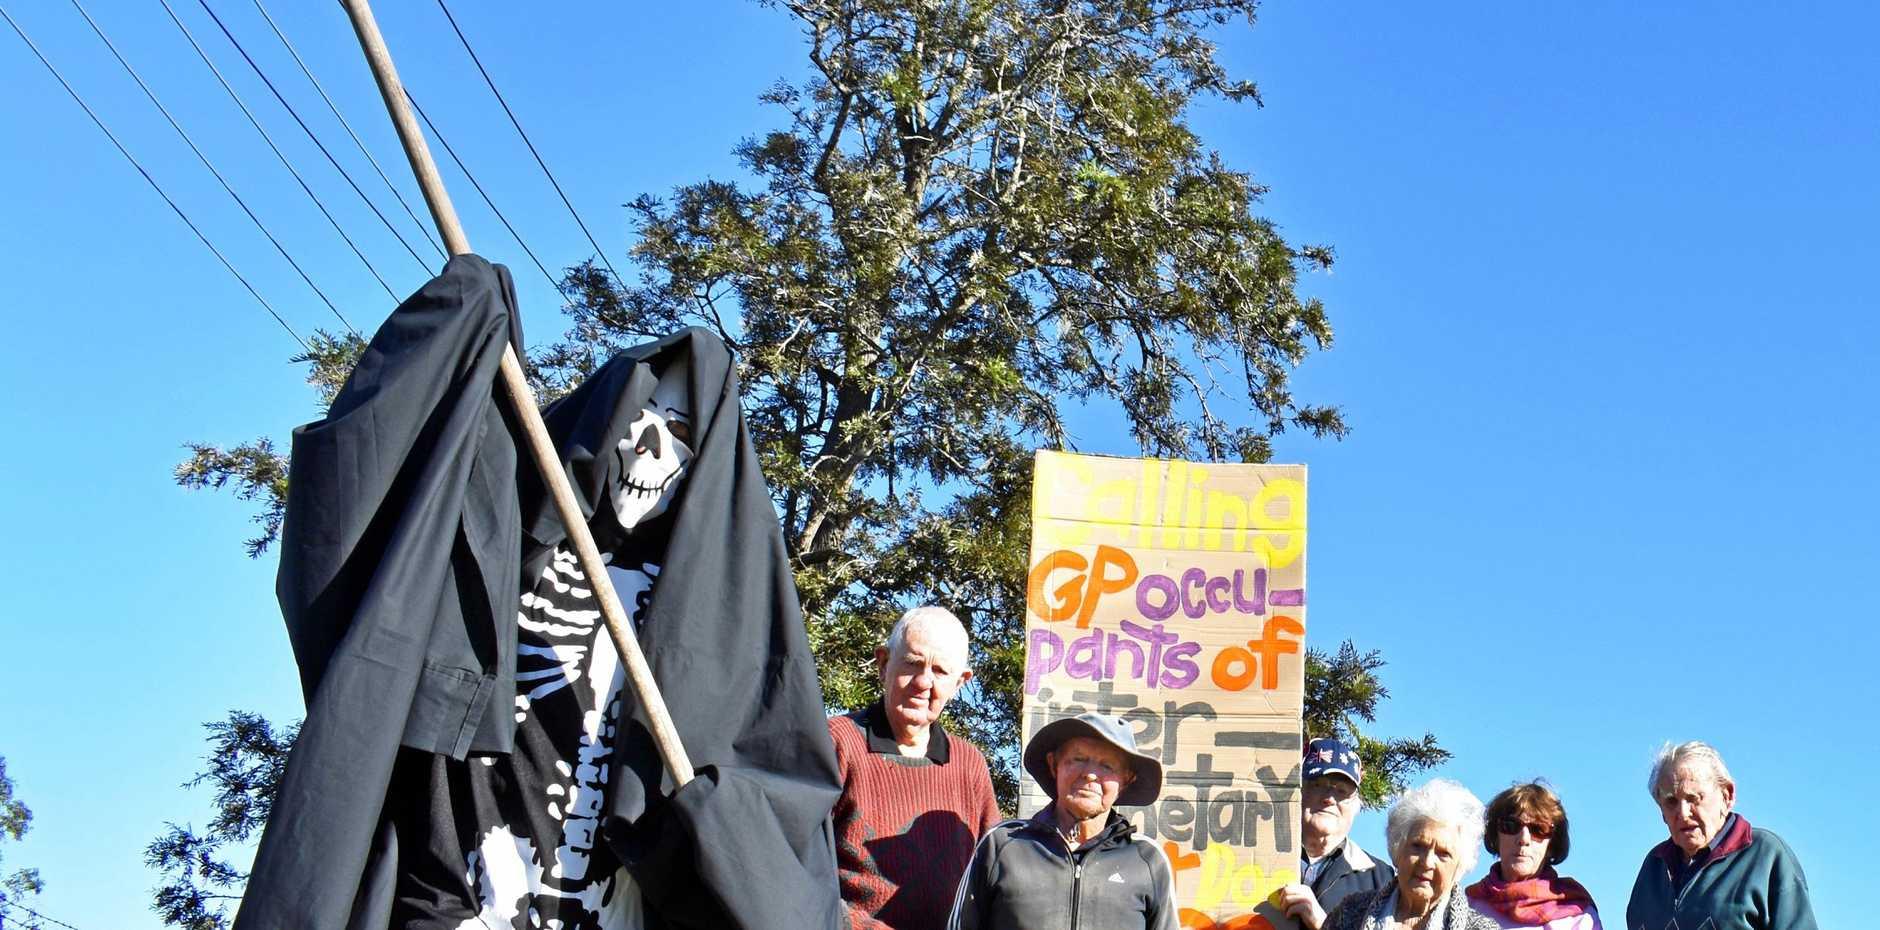 Grim protest about no doctor at the Coraki Campbell HealthOne facility in Coraki.